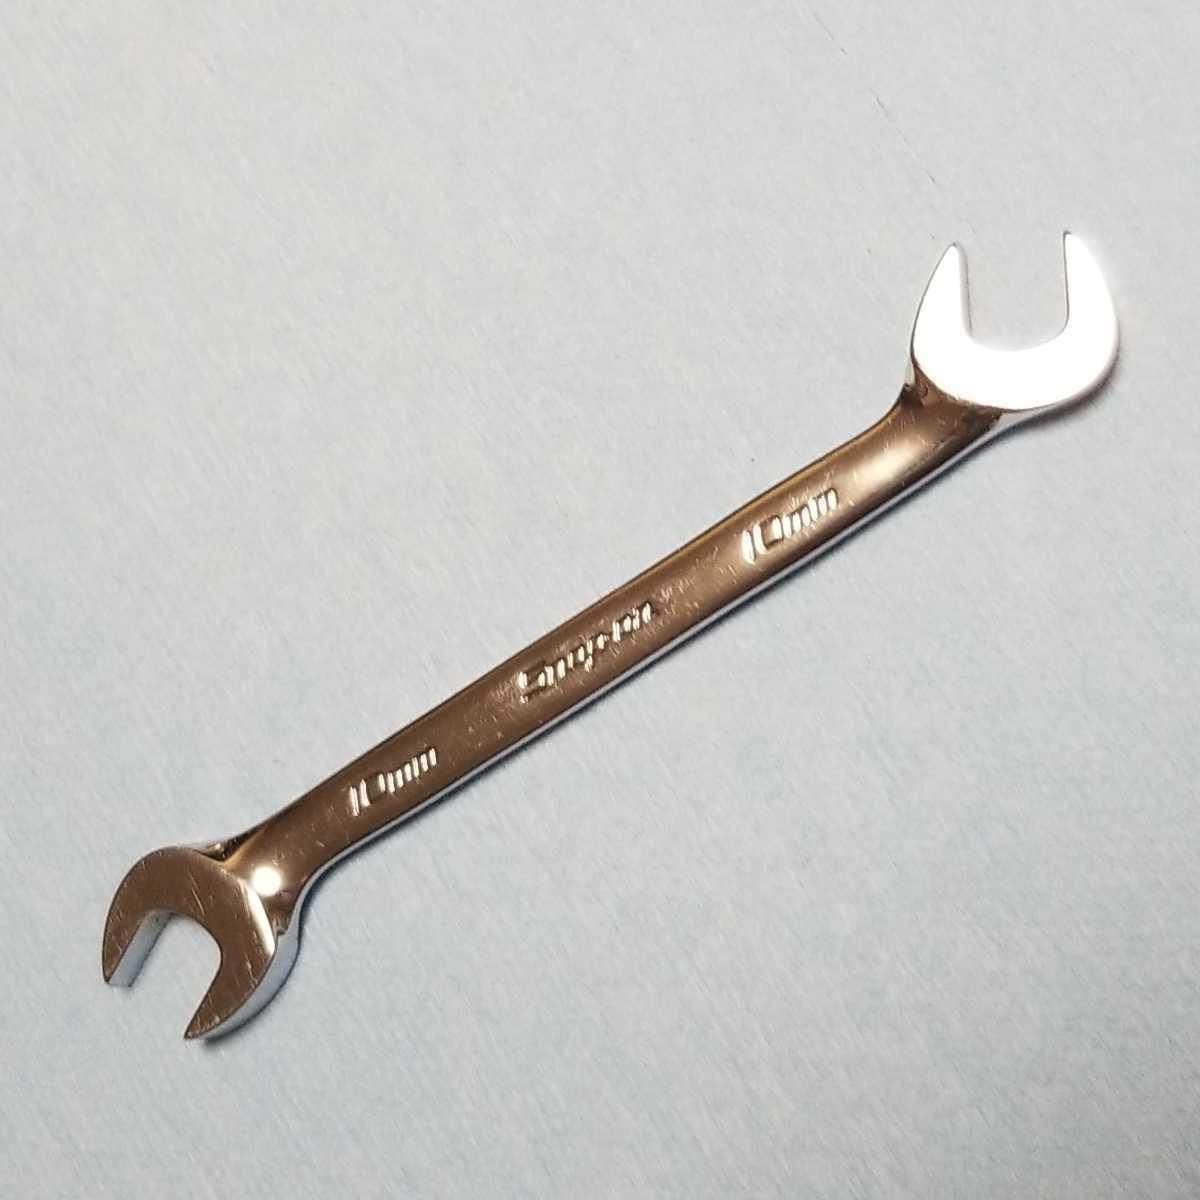 10mm スナップオン 4アングル スパナ VSM5210A 約12.8cm ギザなし 中古品 保管品 SNAPON SNAP-ON Snap-on 両口スパナ_画像1